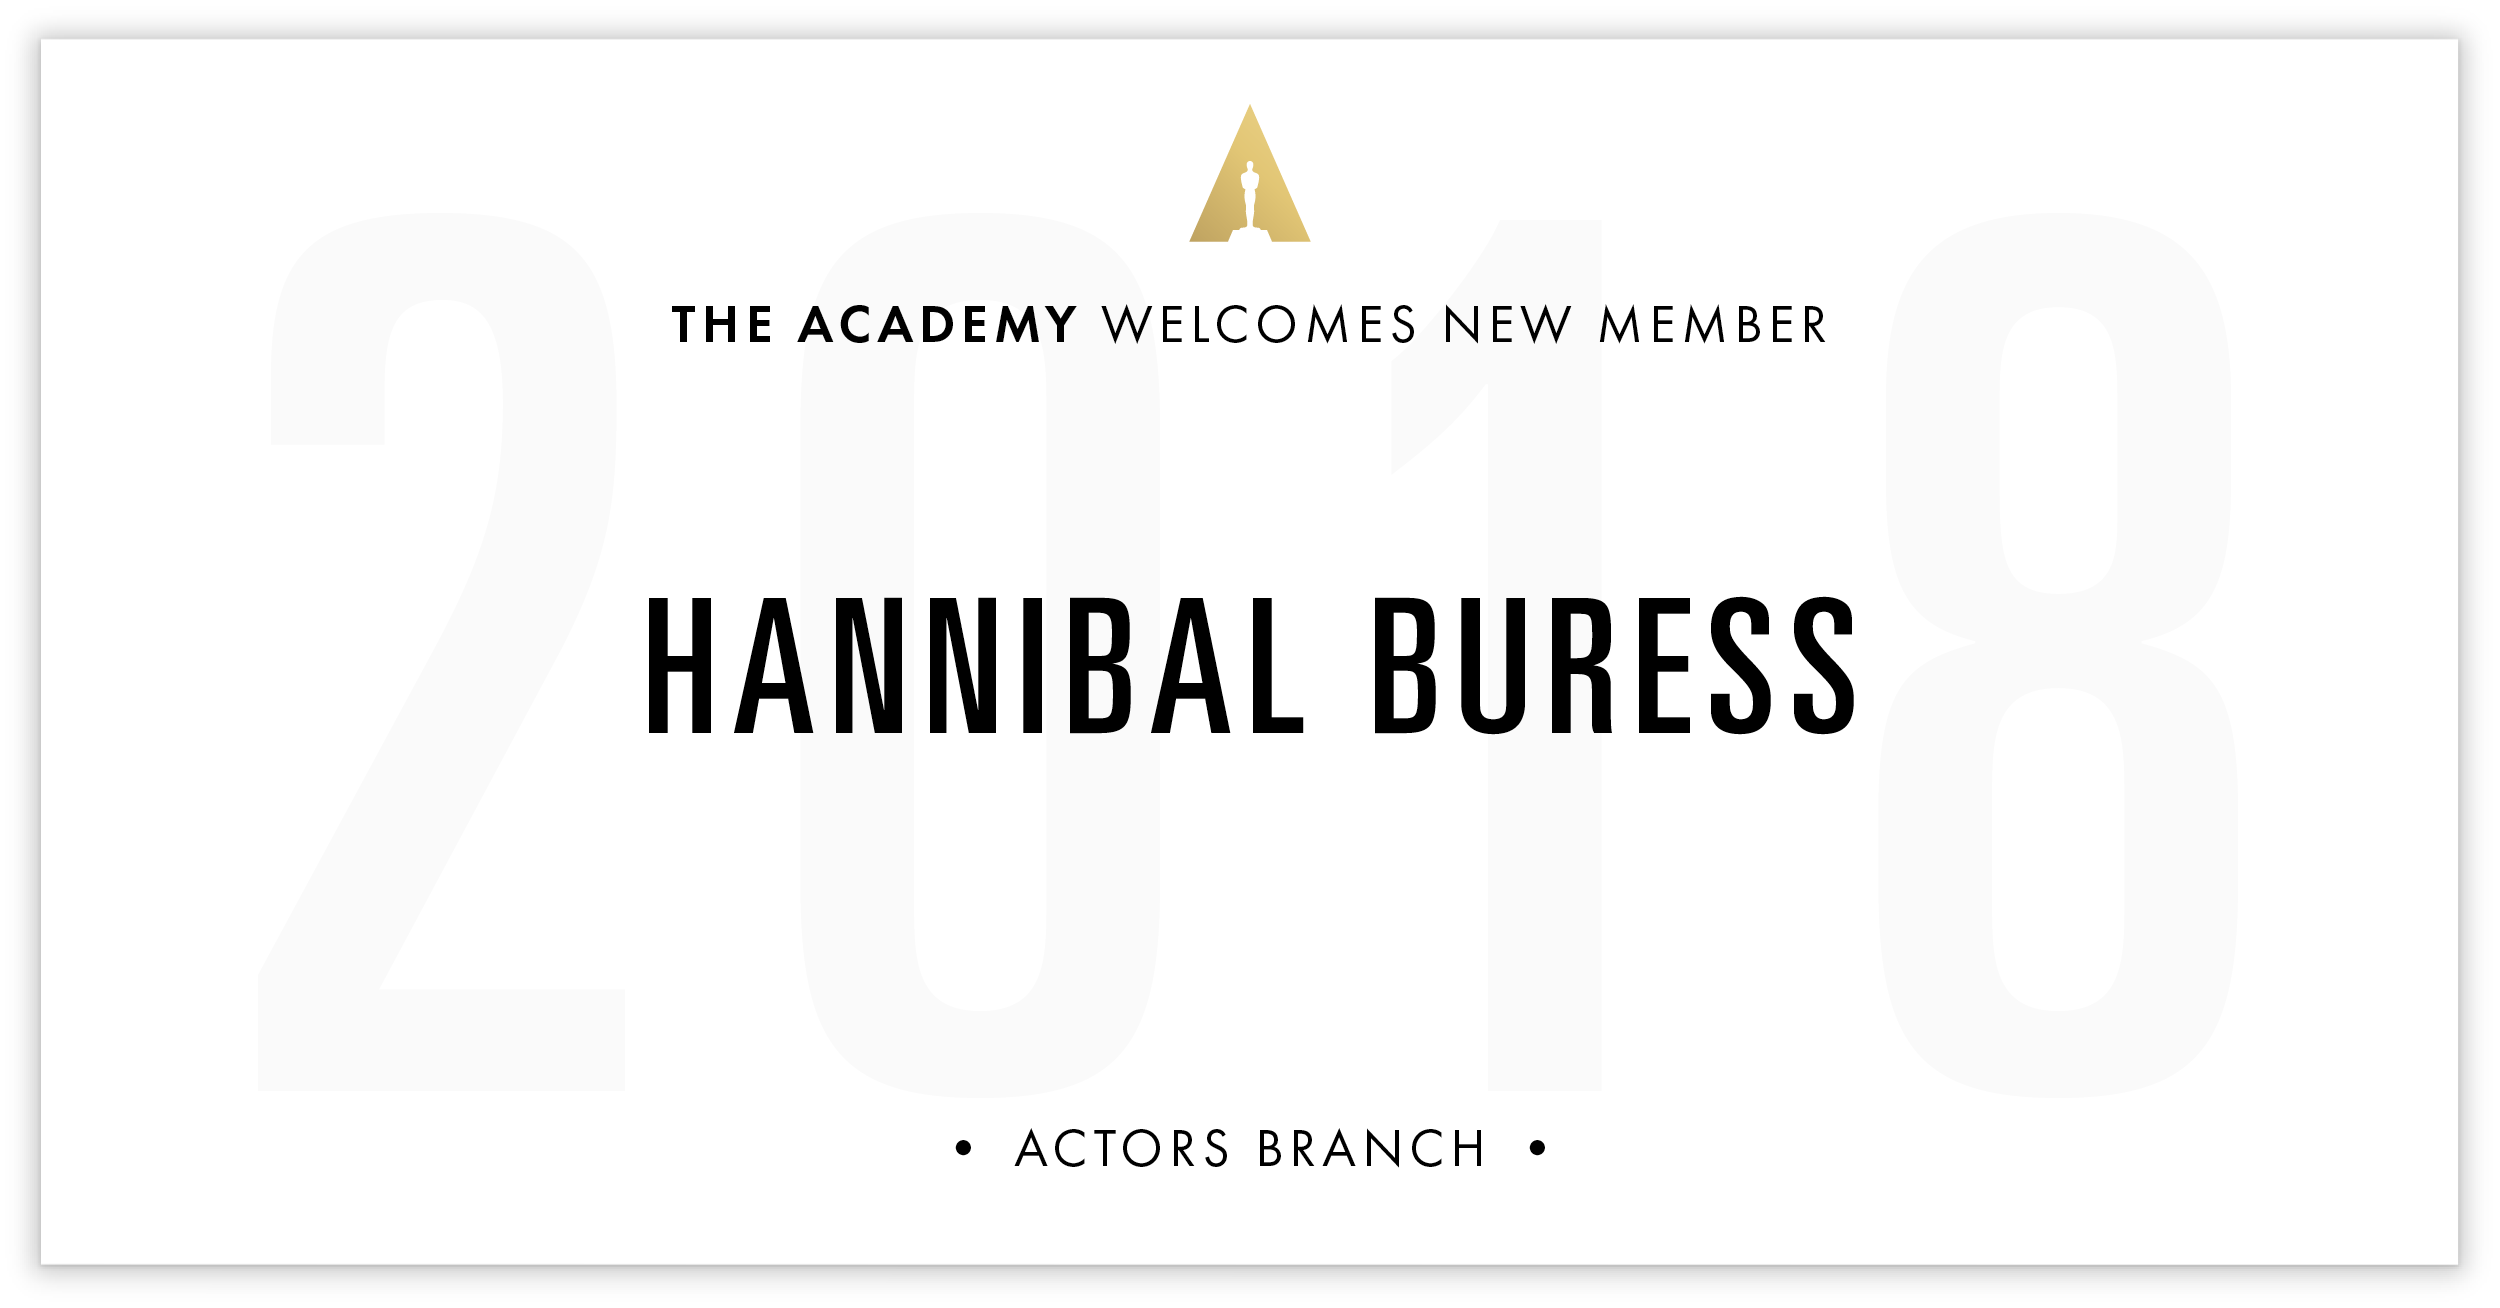 Hannibal Buress is invited!